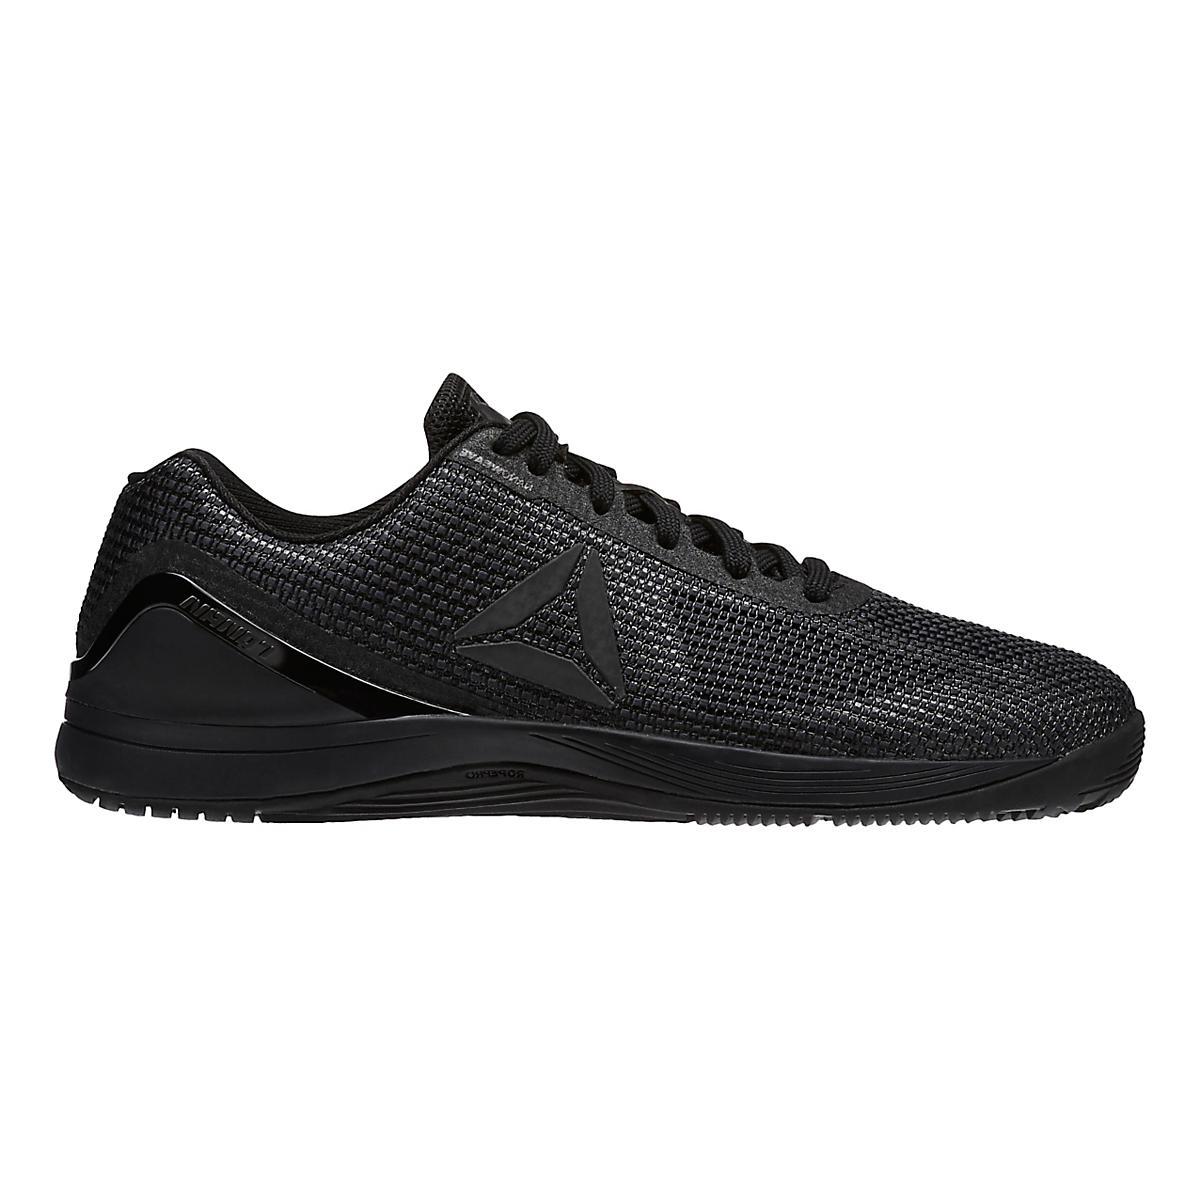 competitive price 89a4d f3af0 Reebok Crossfit Nano 7.0 Men s Cross Trainer Shoes